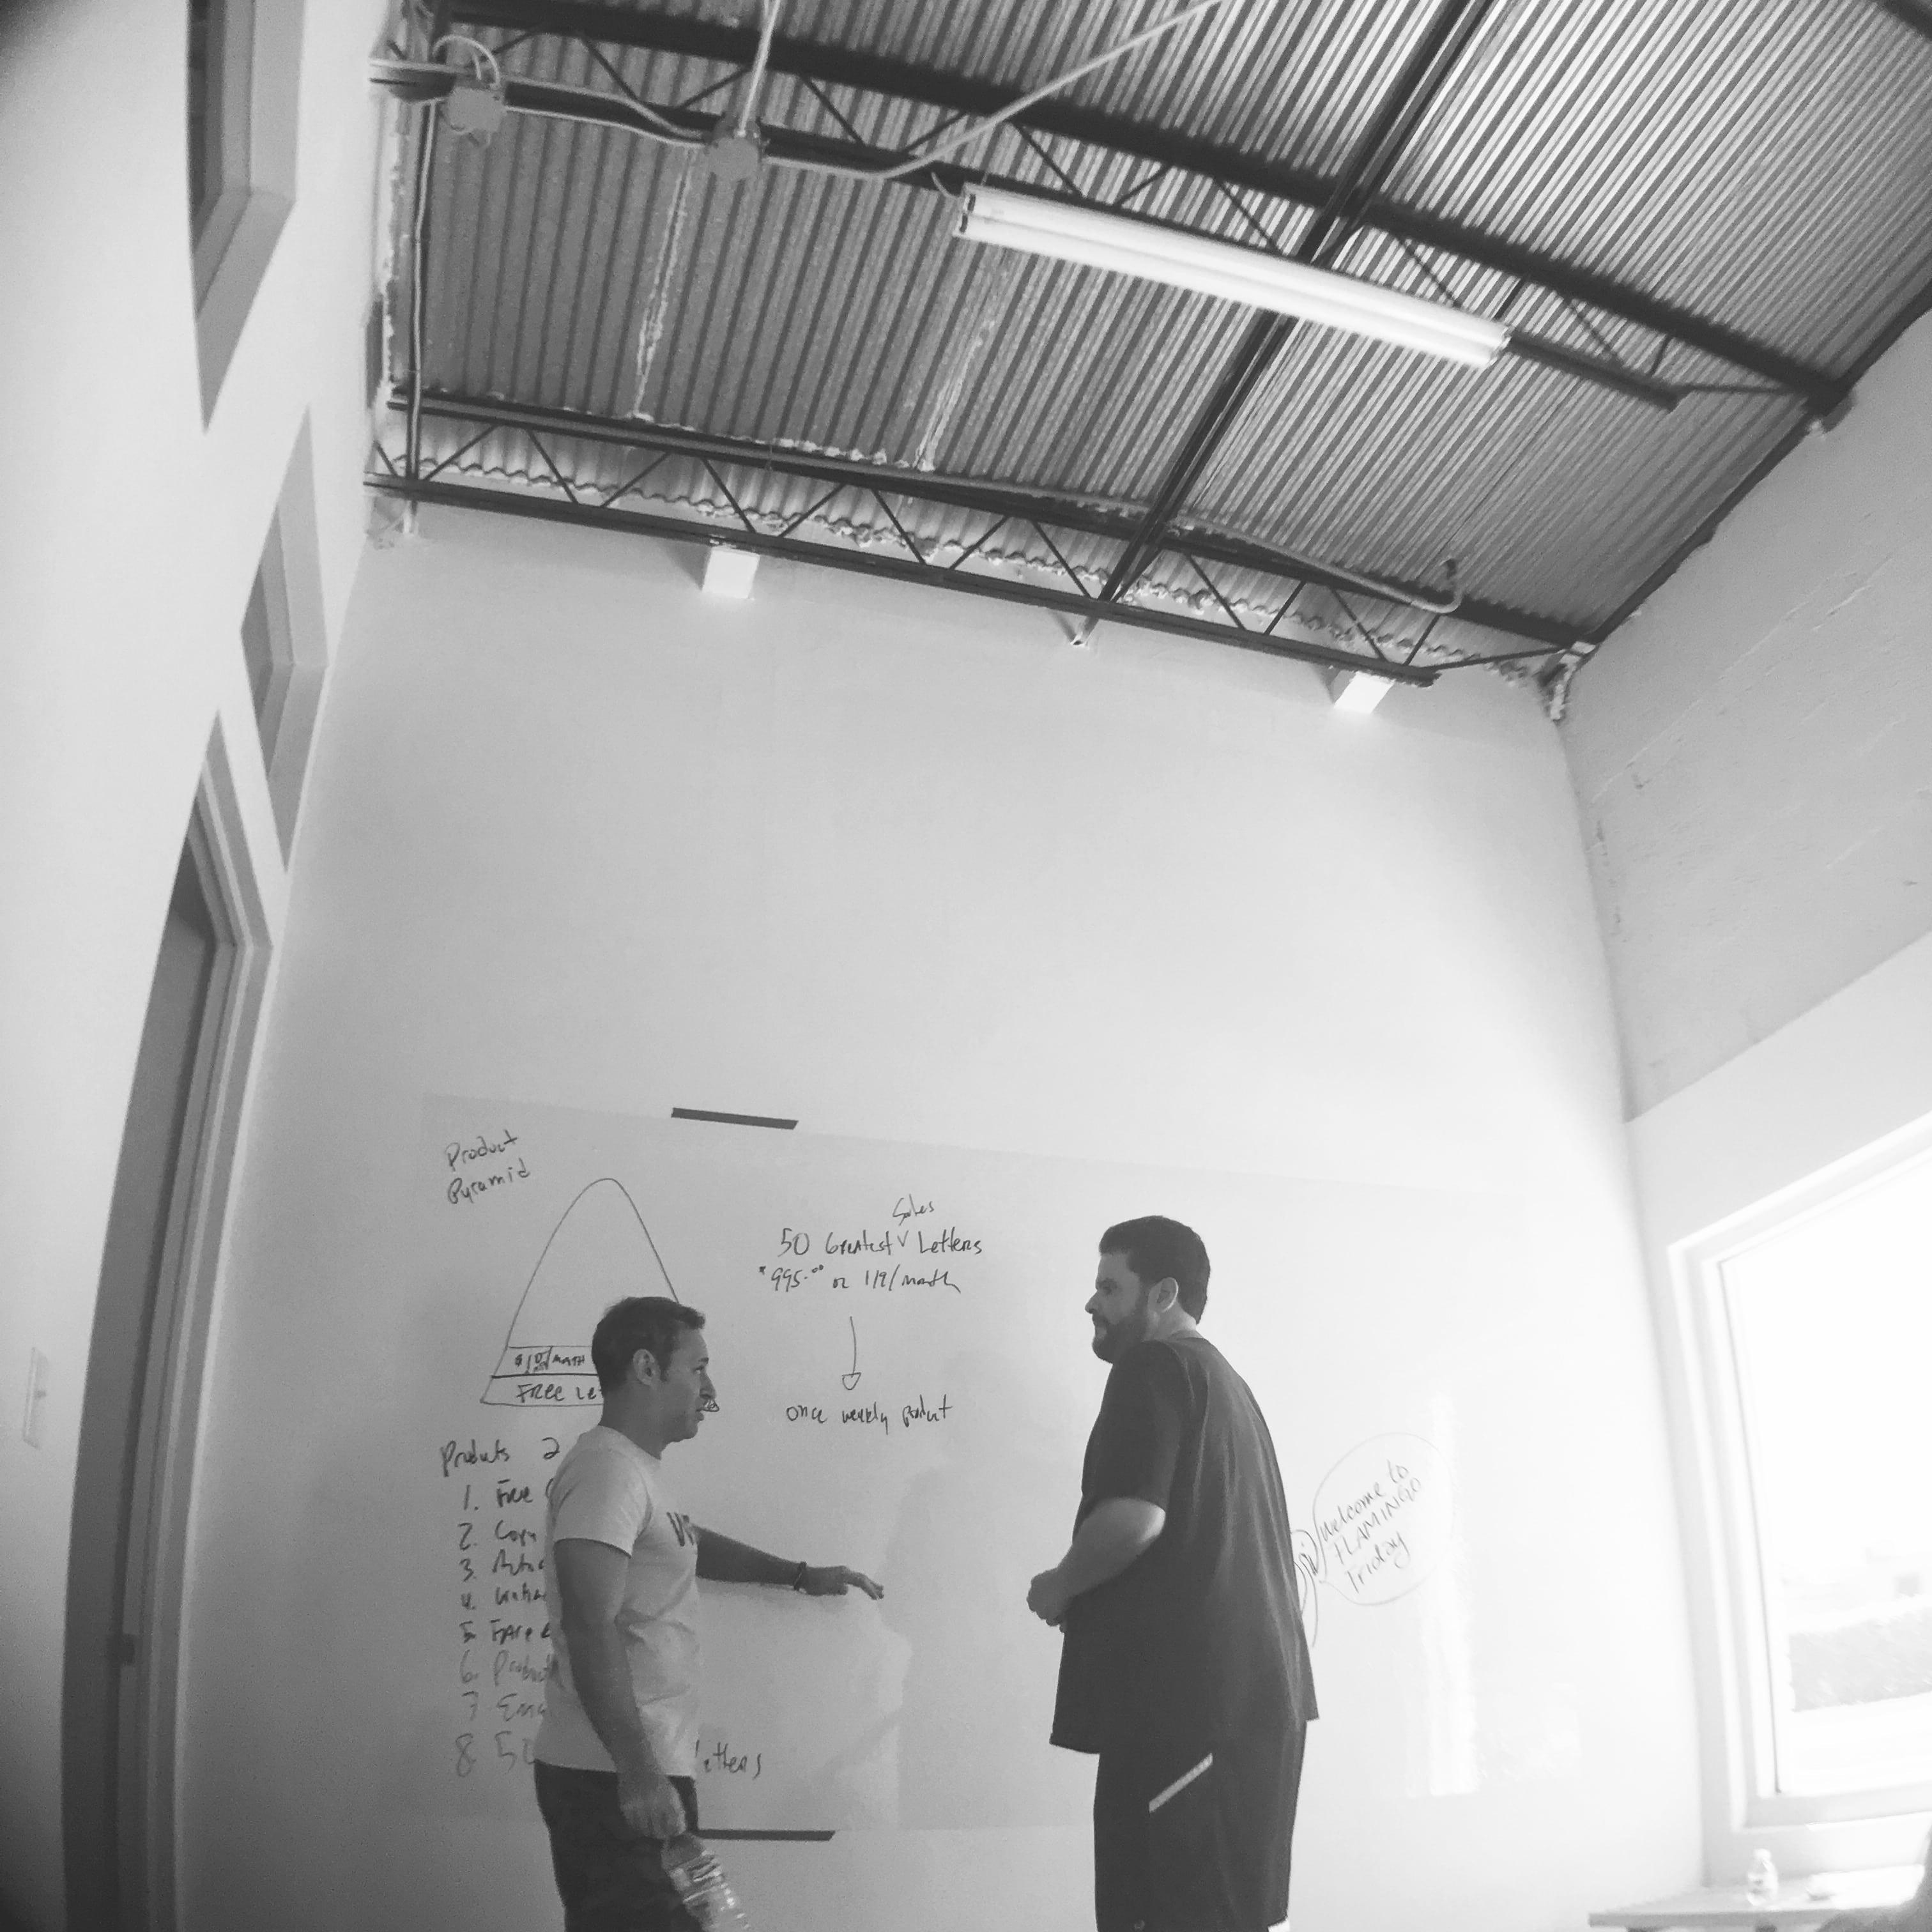 Brainstorm Collaboration